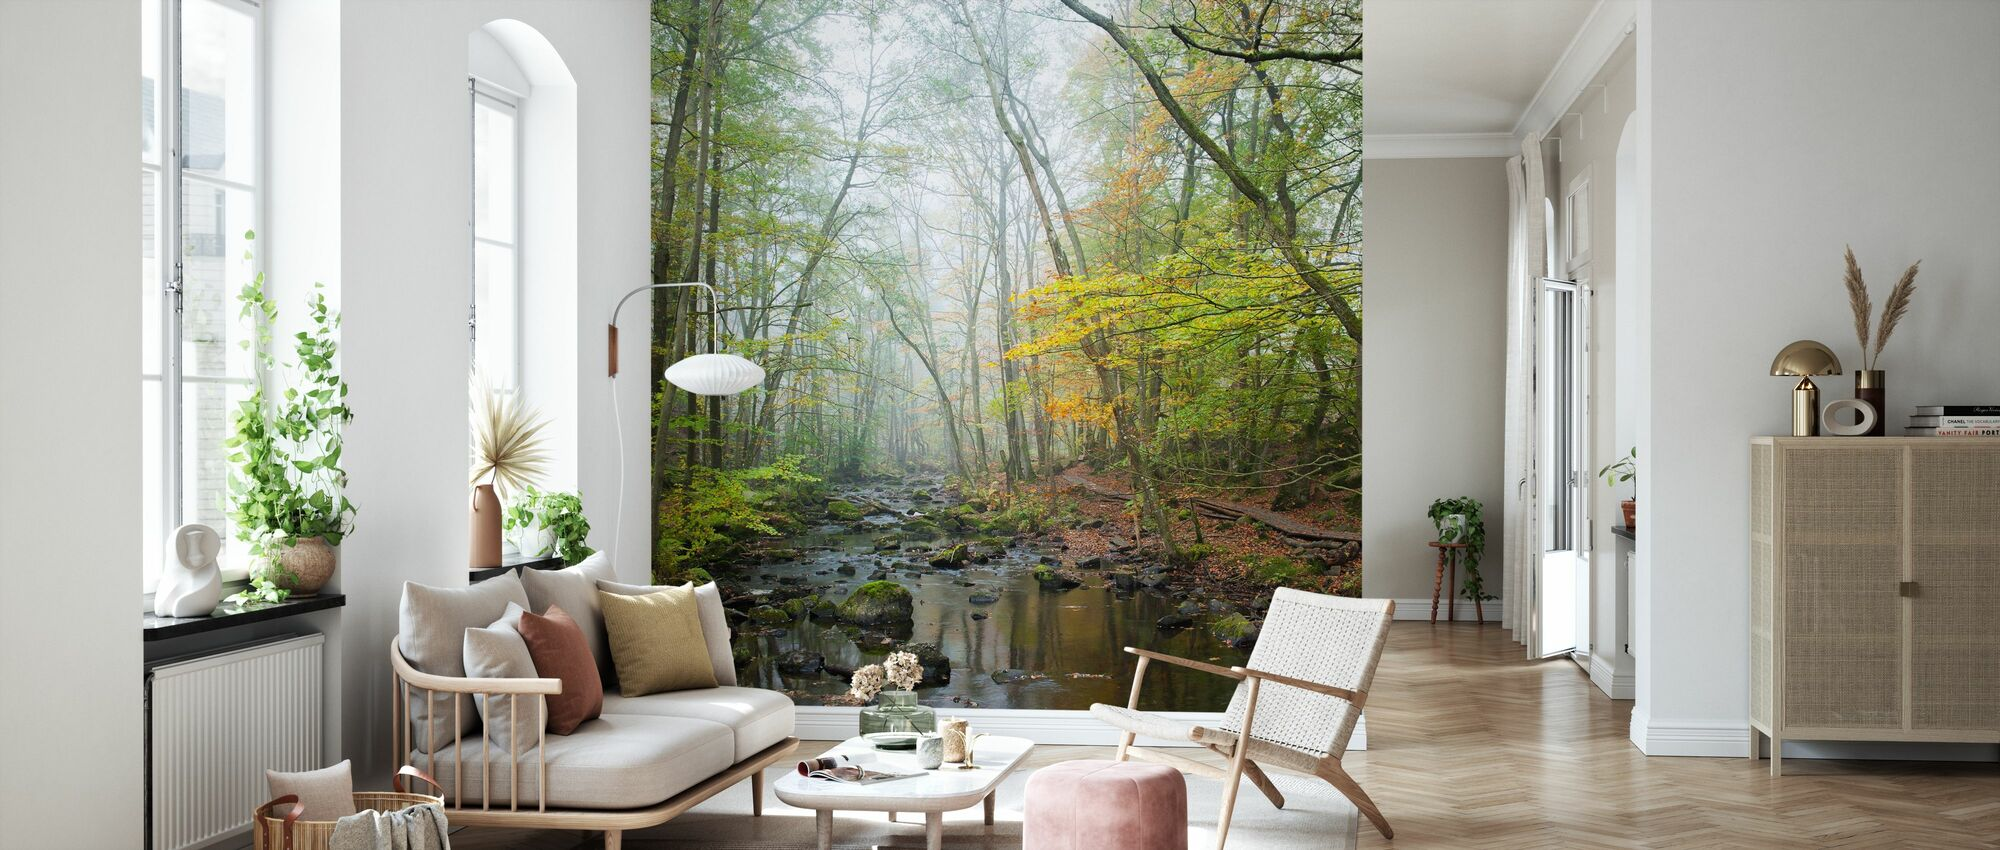 Stream in Swedish Beech Forest I - Wallpaper - Living Room